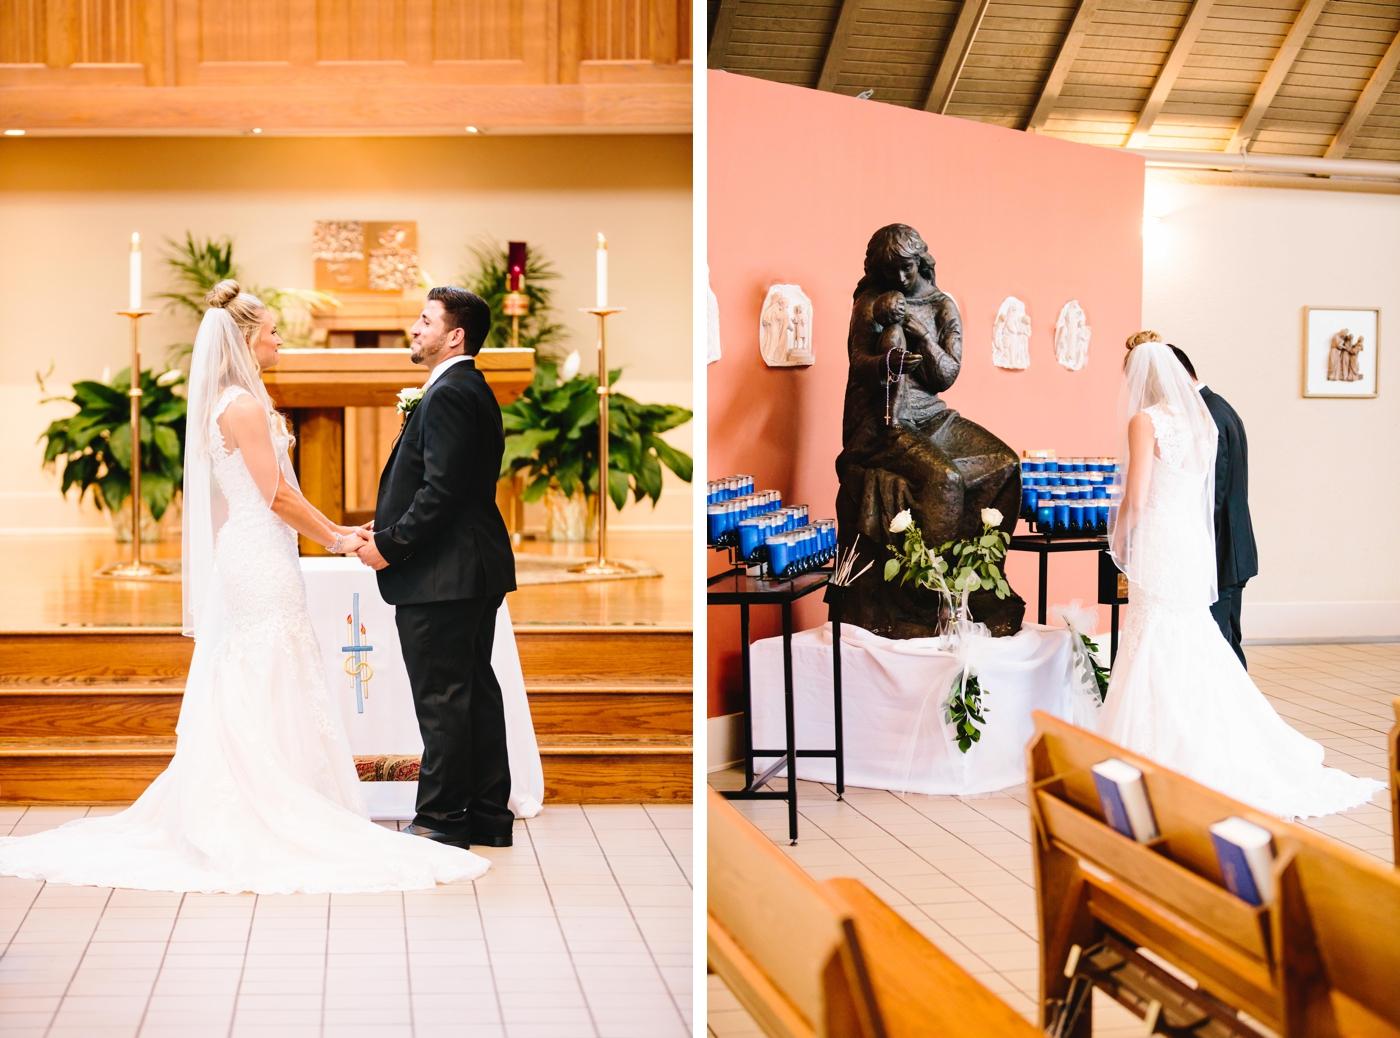 chicago-fine-art-wedding-photography-patano23